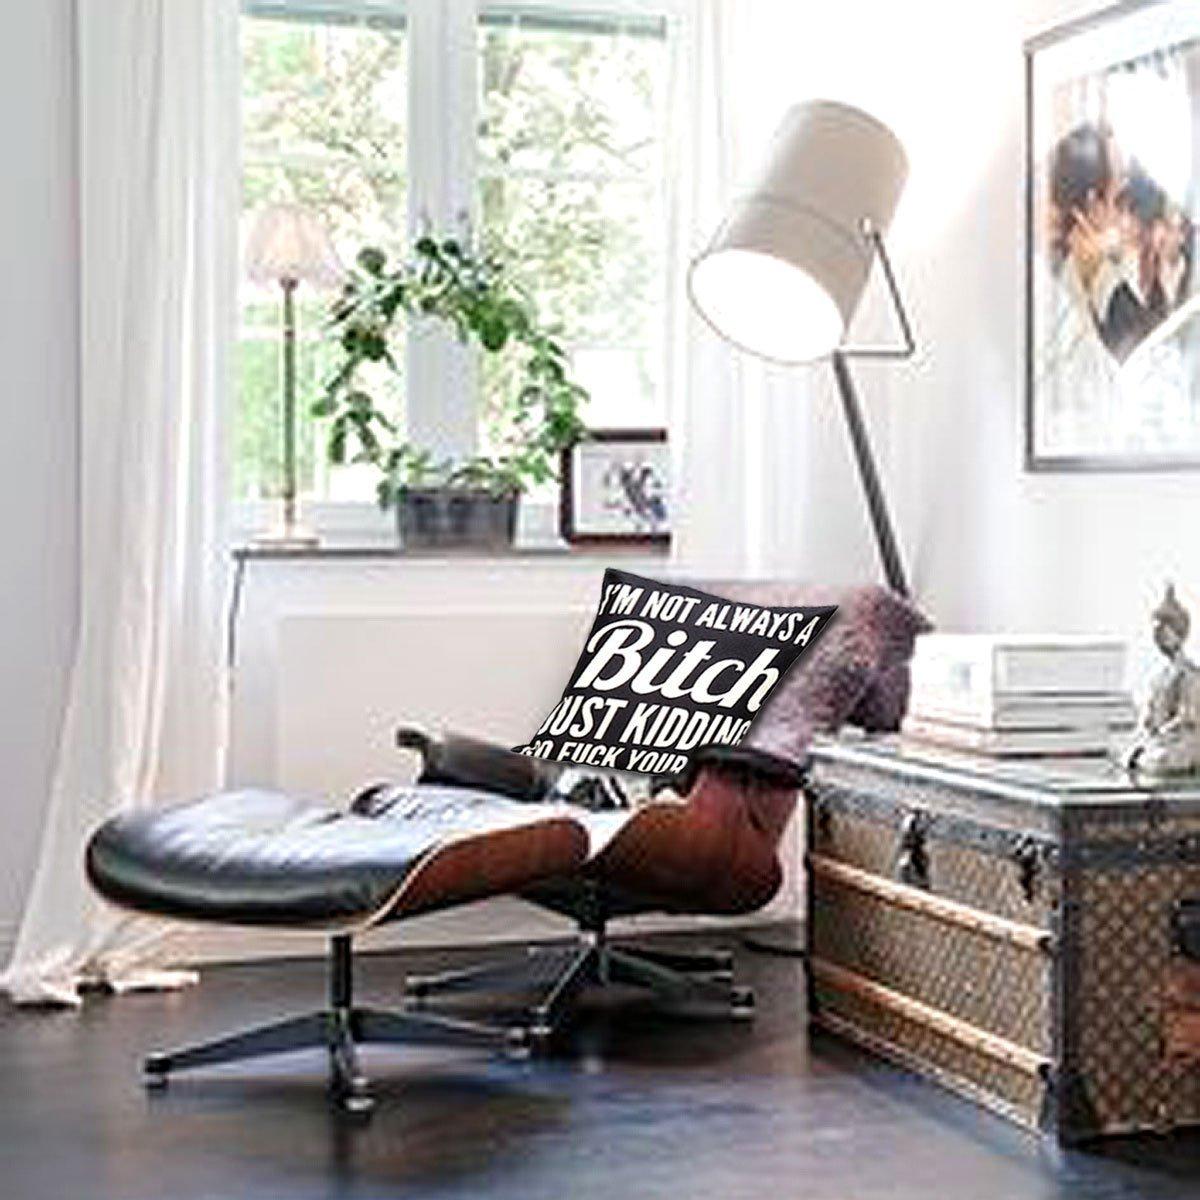 VERISA Decorative Cotton Linen Bitch Pattern Adult Theme Room Decor Fun Sofa Throw Pillow Cover Cases 18x18inches Black